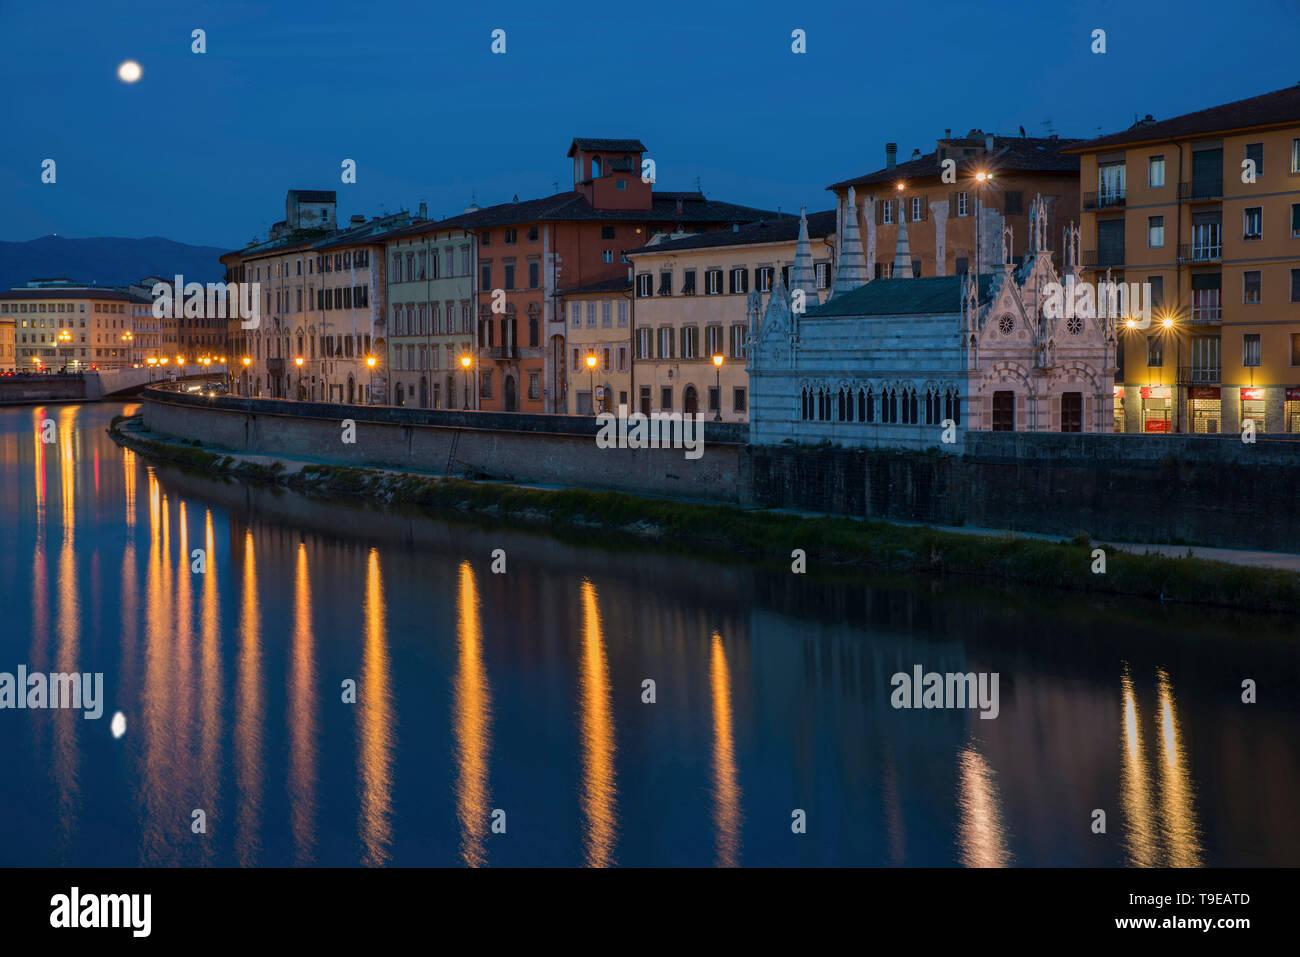 pisa, lungarno, santa maria della spina,  tuscany,  italy - Stock Image